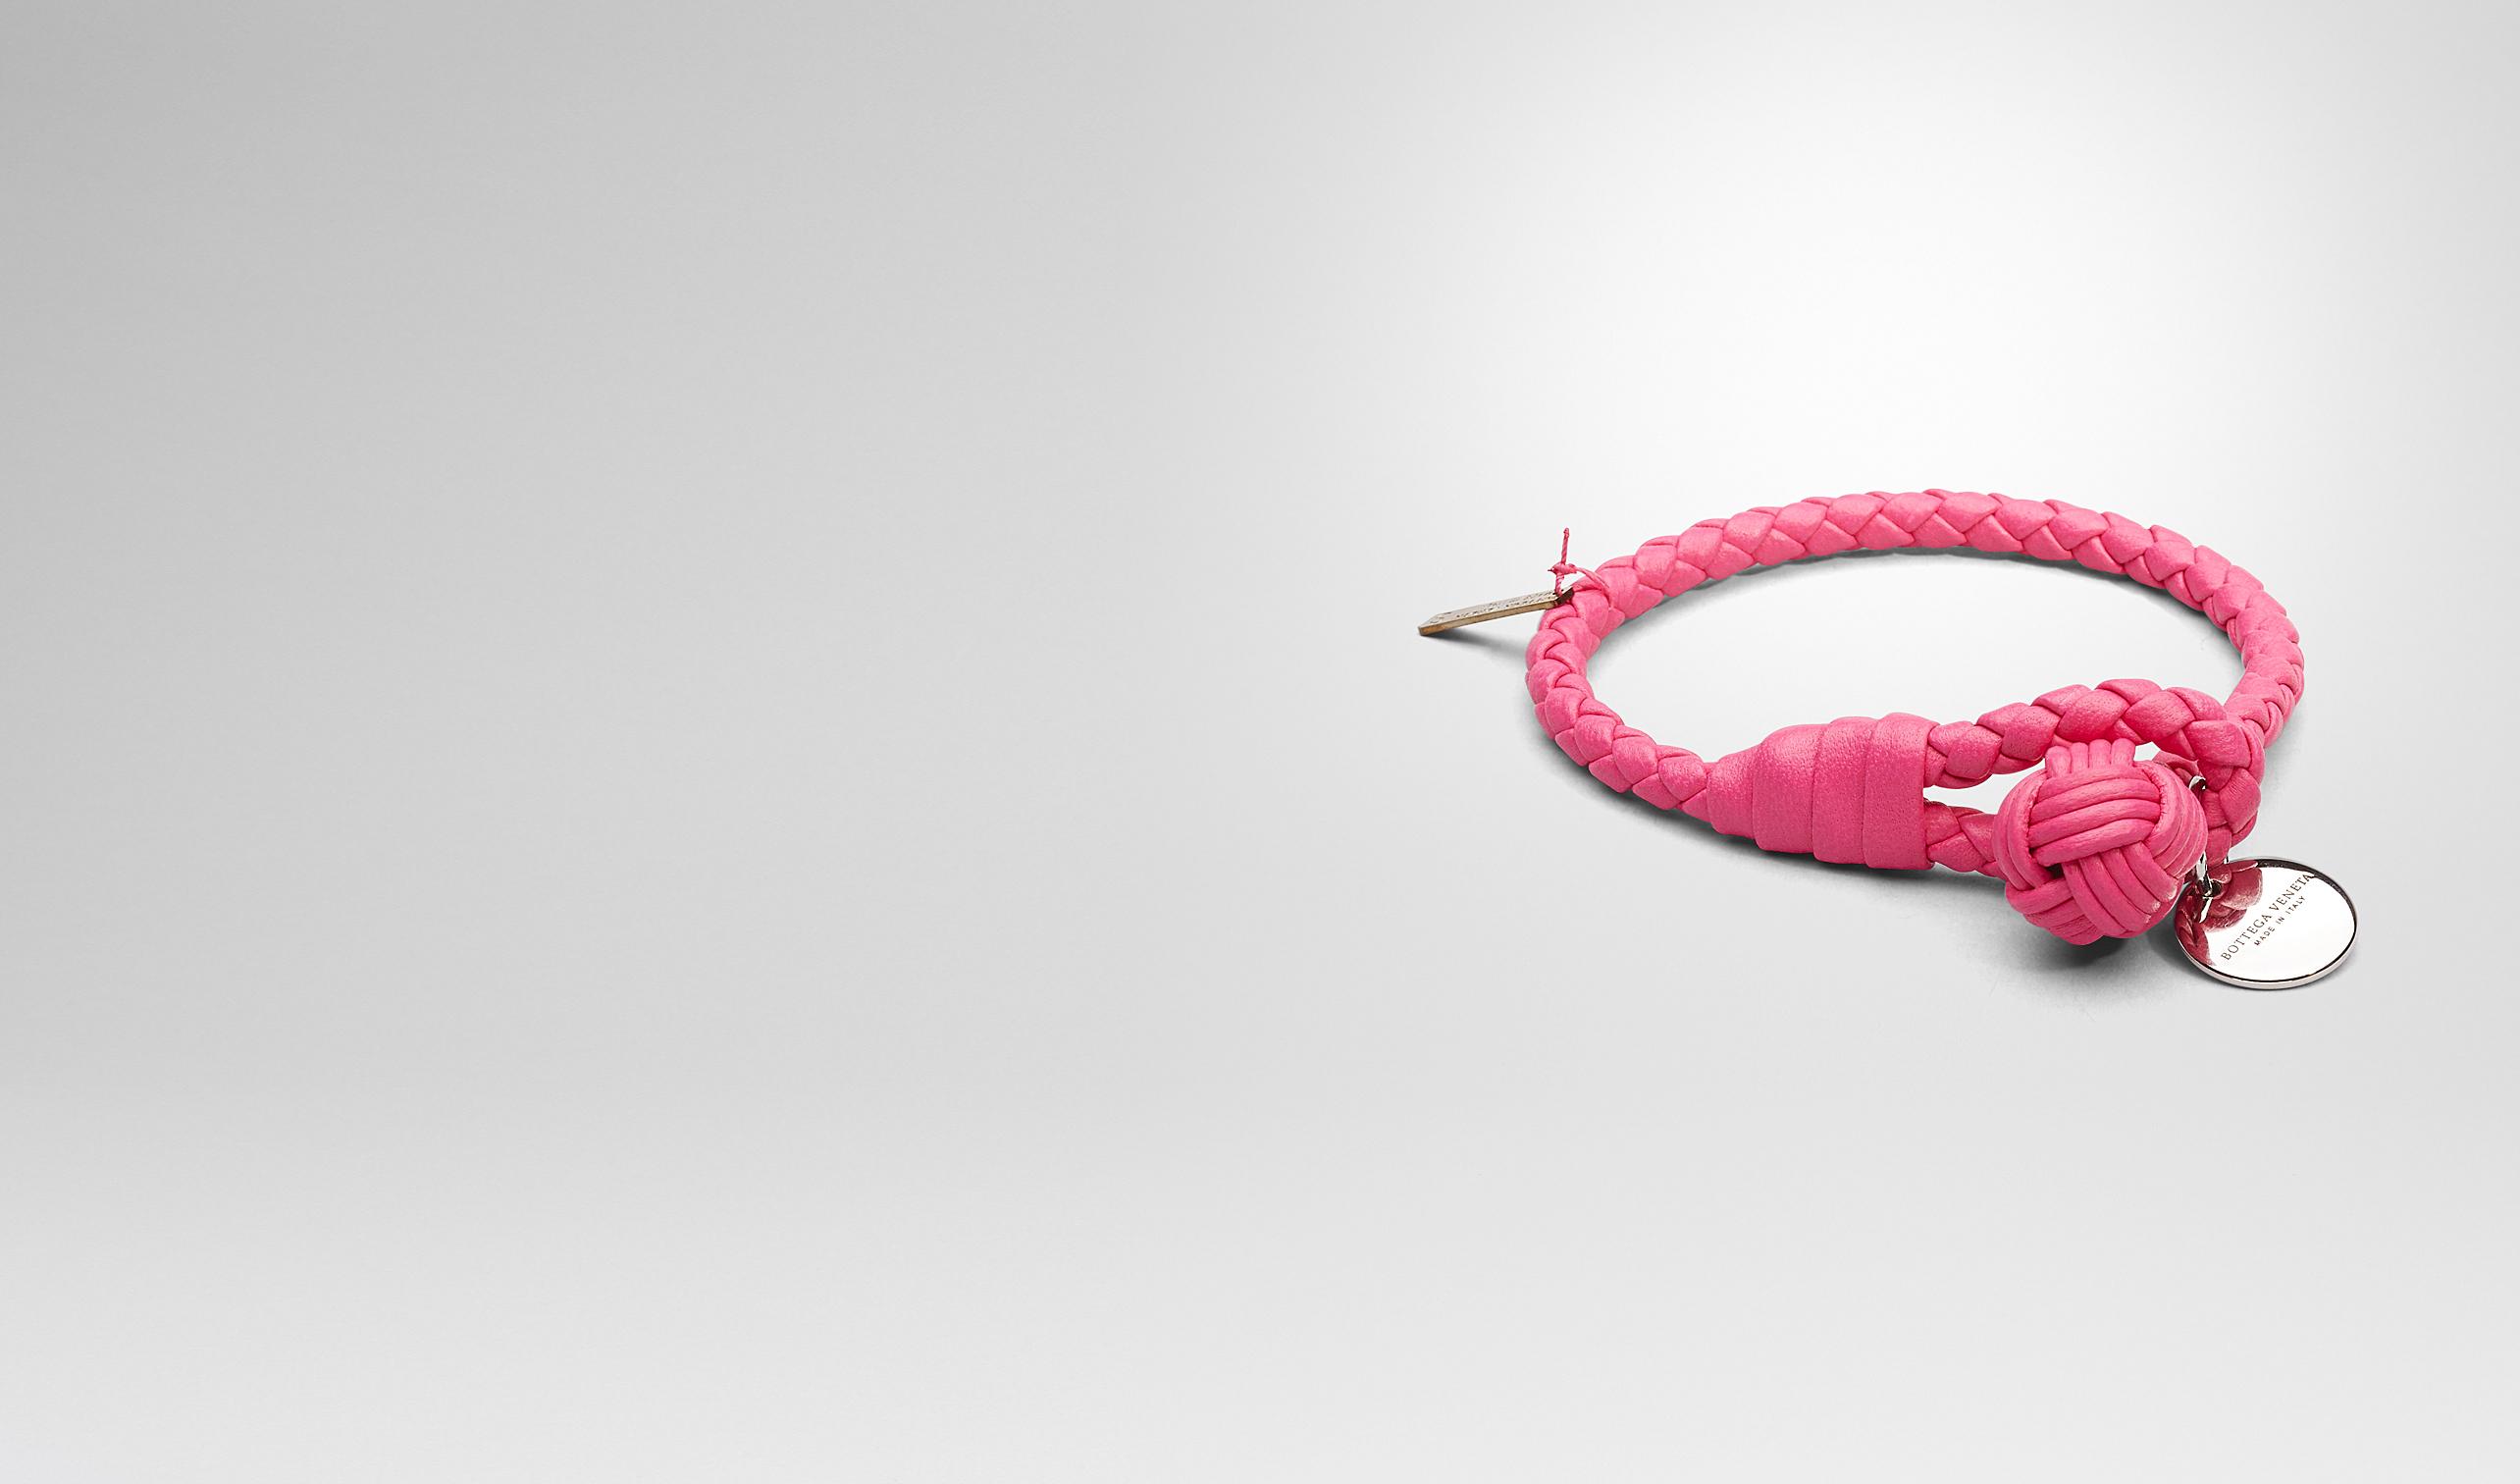 BOTTEGA VENETA Porte-clé ou Bracelet E BRACELET ROSE SHOCKING EN NAPPA INTRECCIATO pl